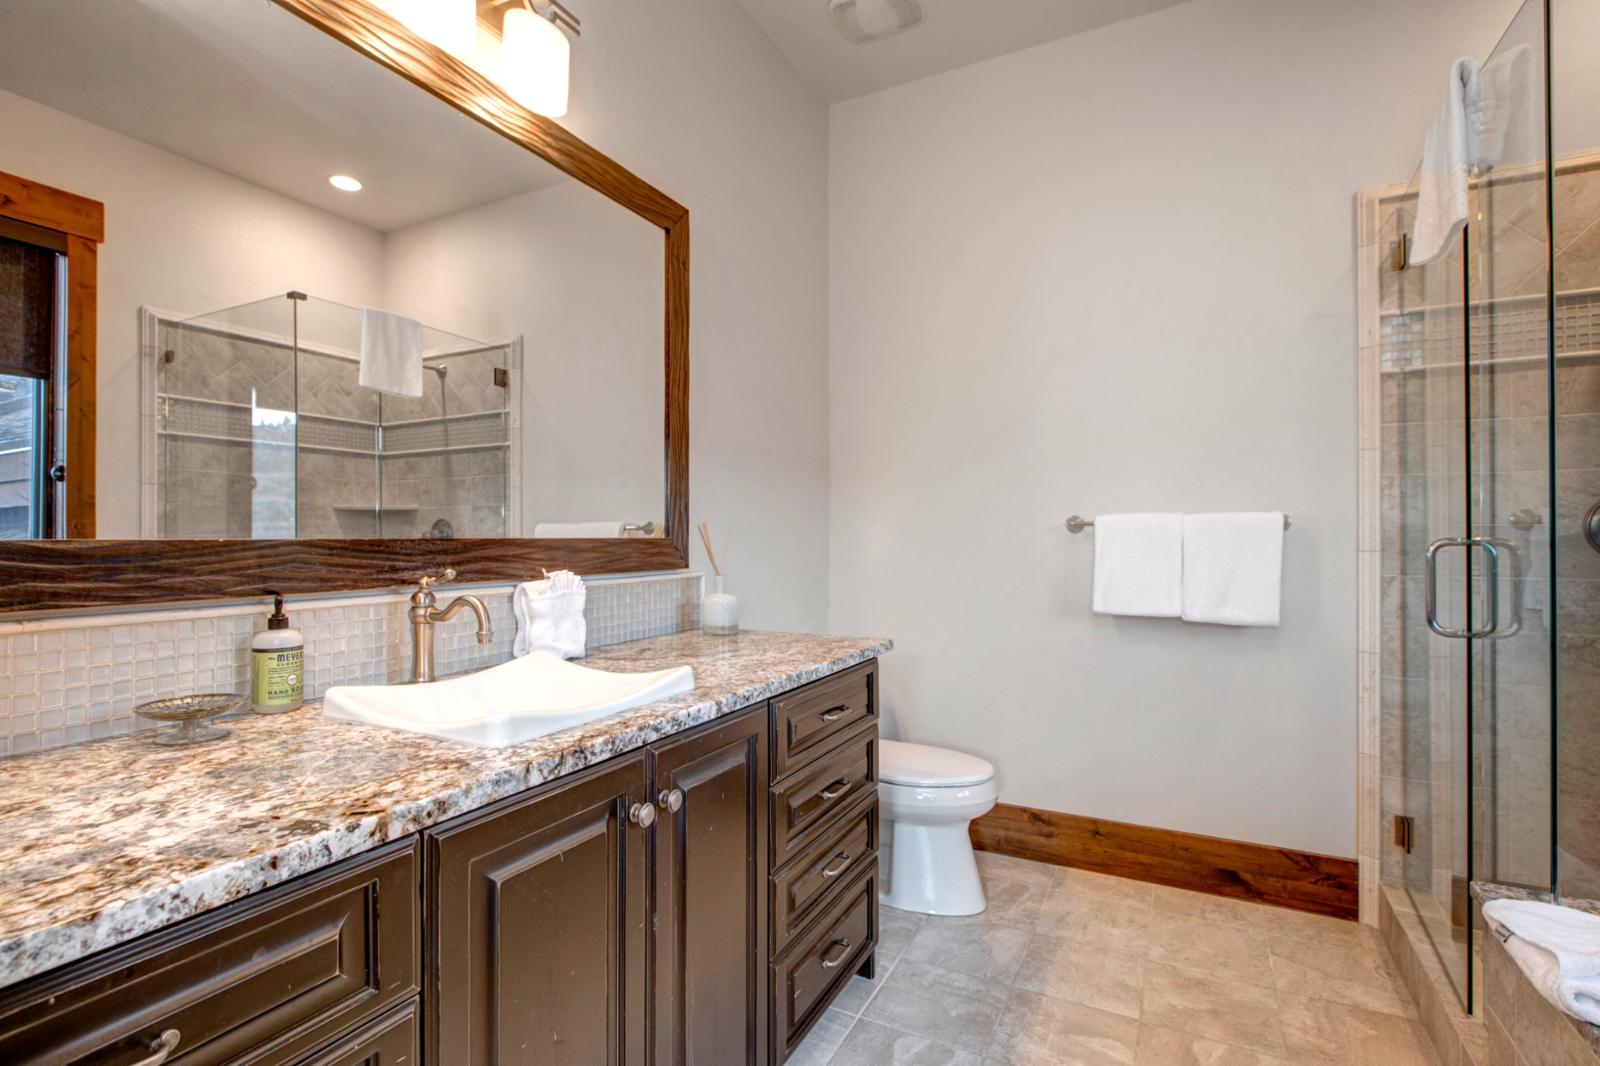 En suite bathroom for the Farrah Fawcett room